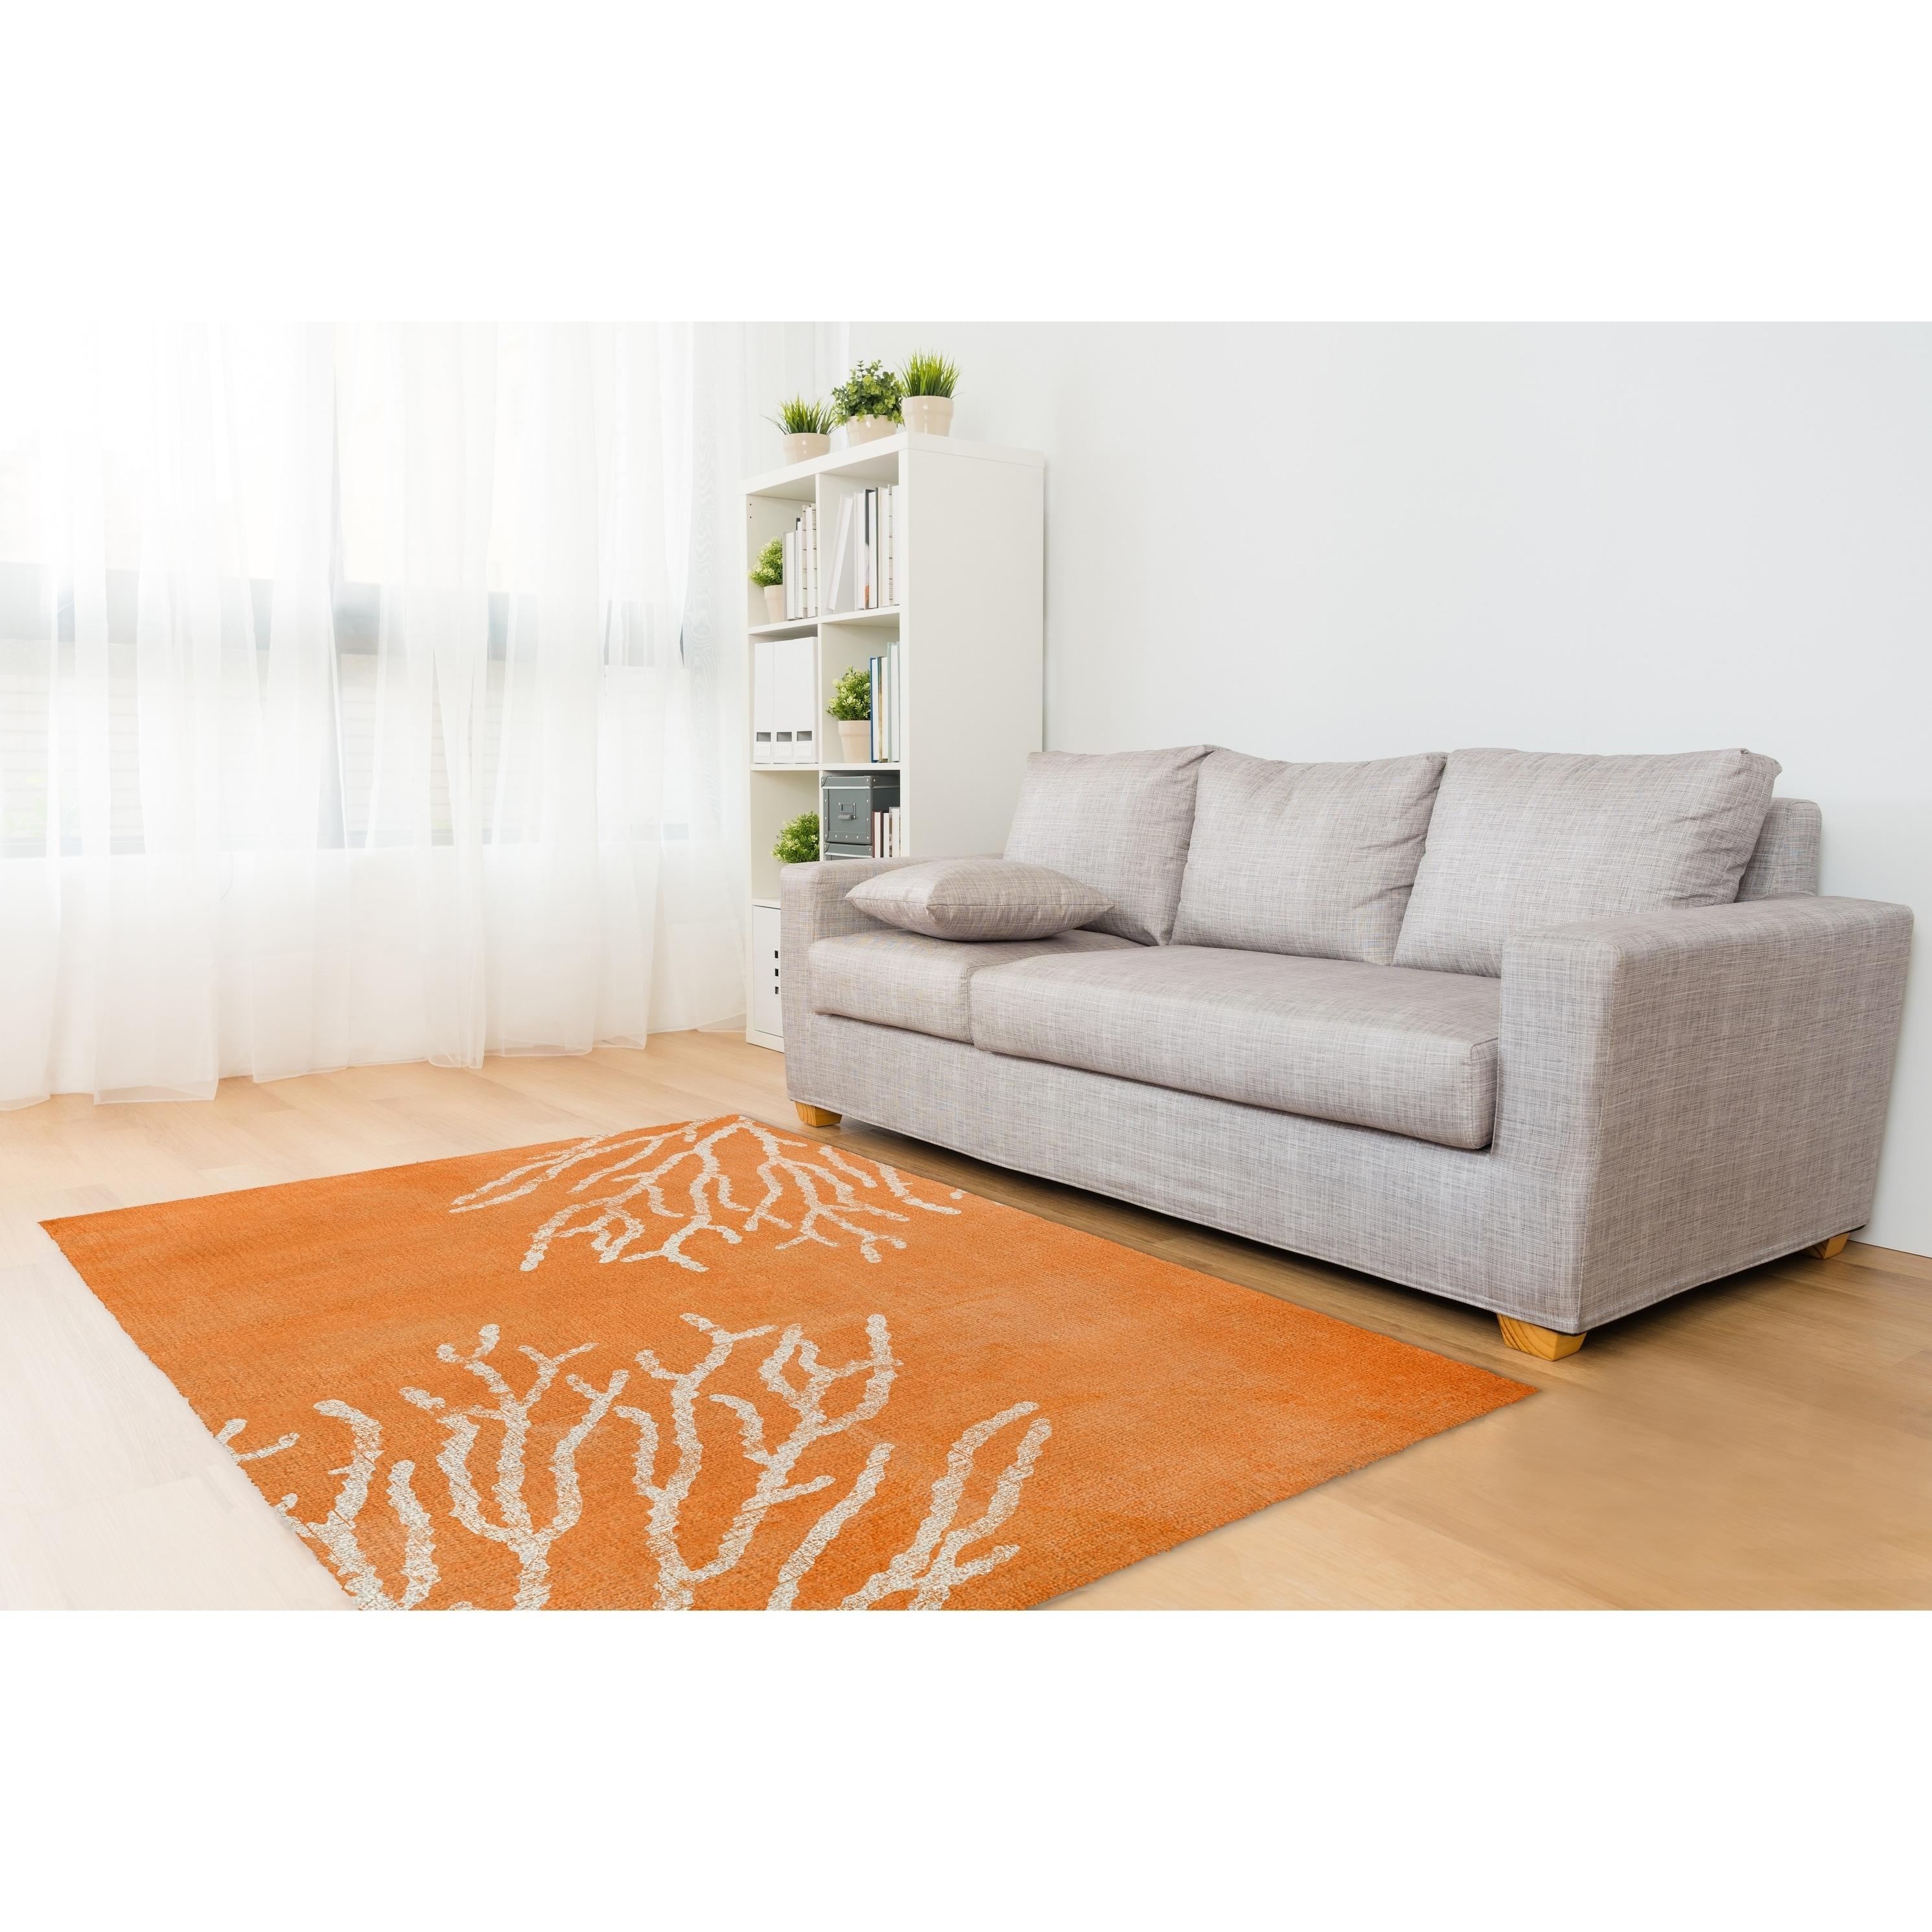 Shop Kavka Designs Sultana Orange/ White Area Rug (8\'X10\') - 8\' x 10 ...